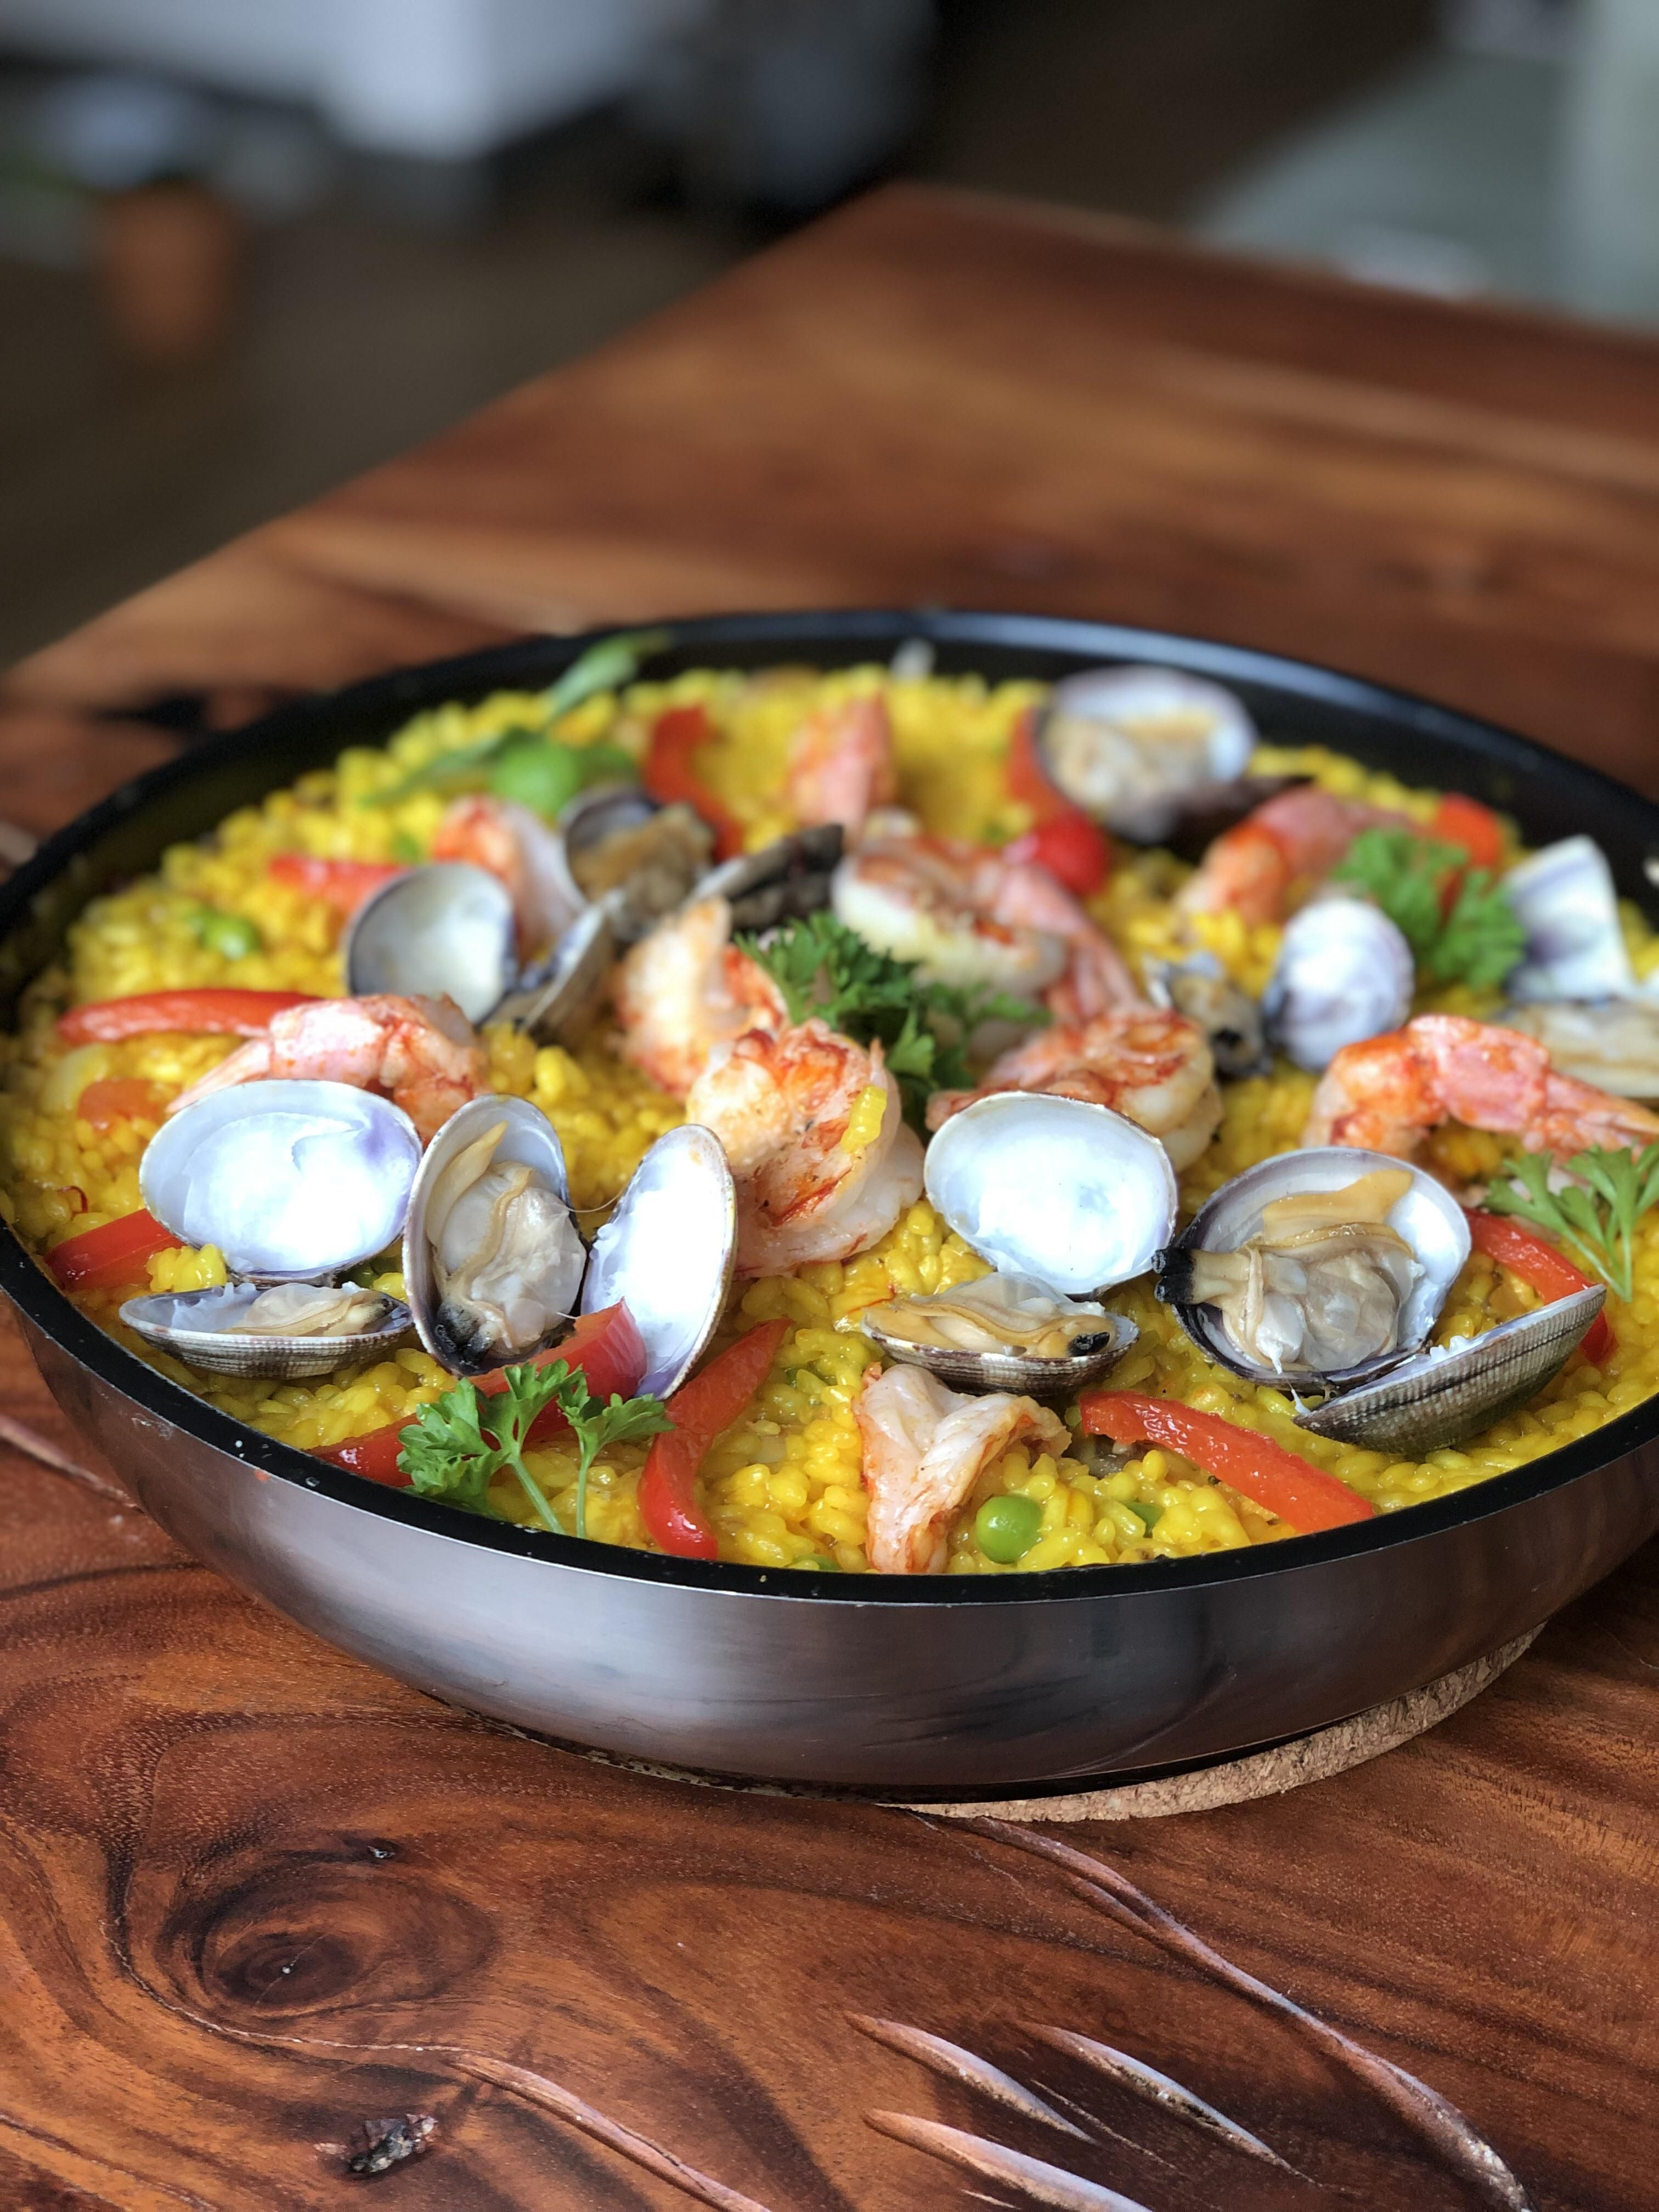 Pin On Gastronomic Inspiration